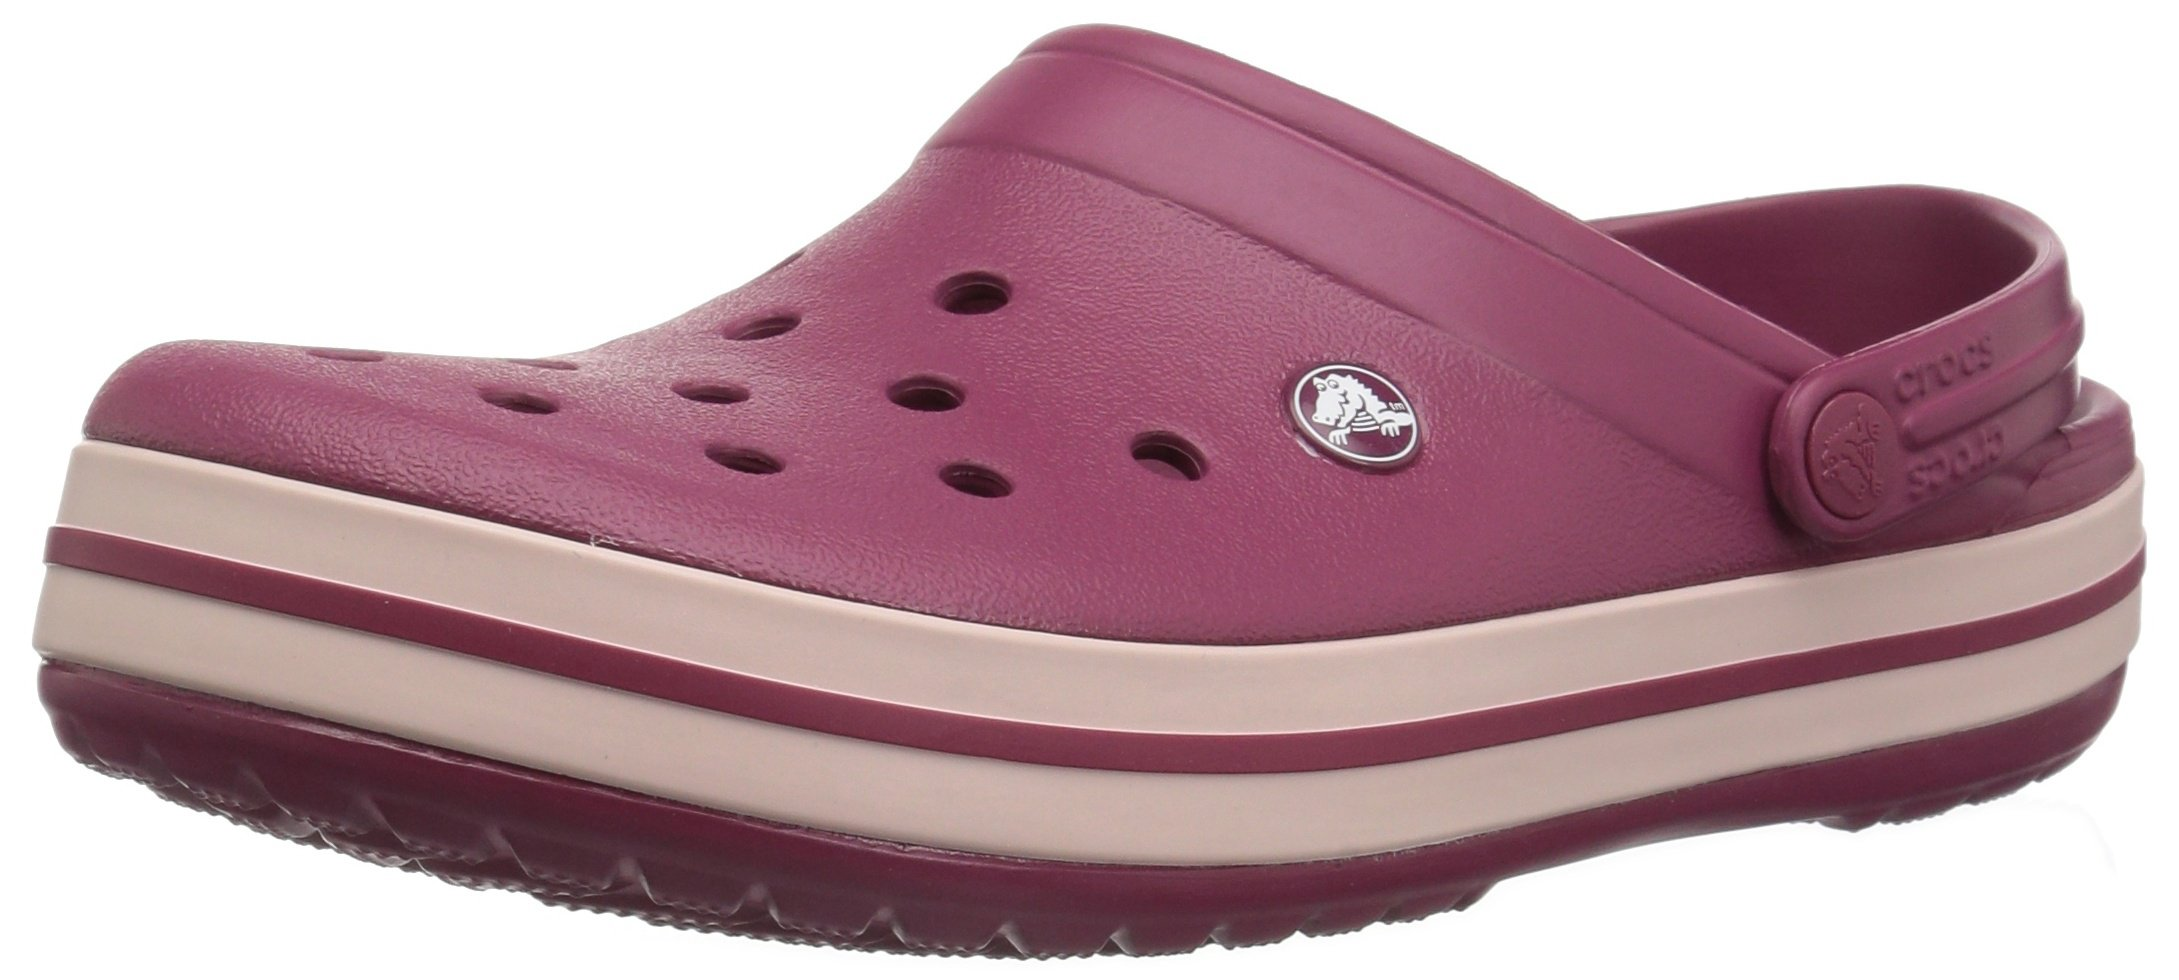 Crocs Crocband Clog, Pomegranate/Rose Dust, 7 US Men / 9 US Women